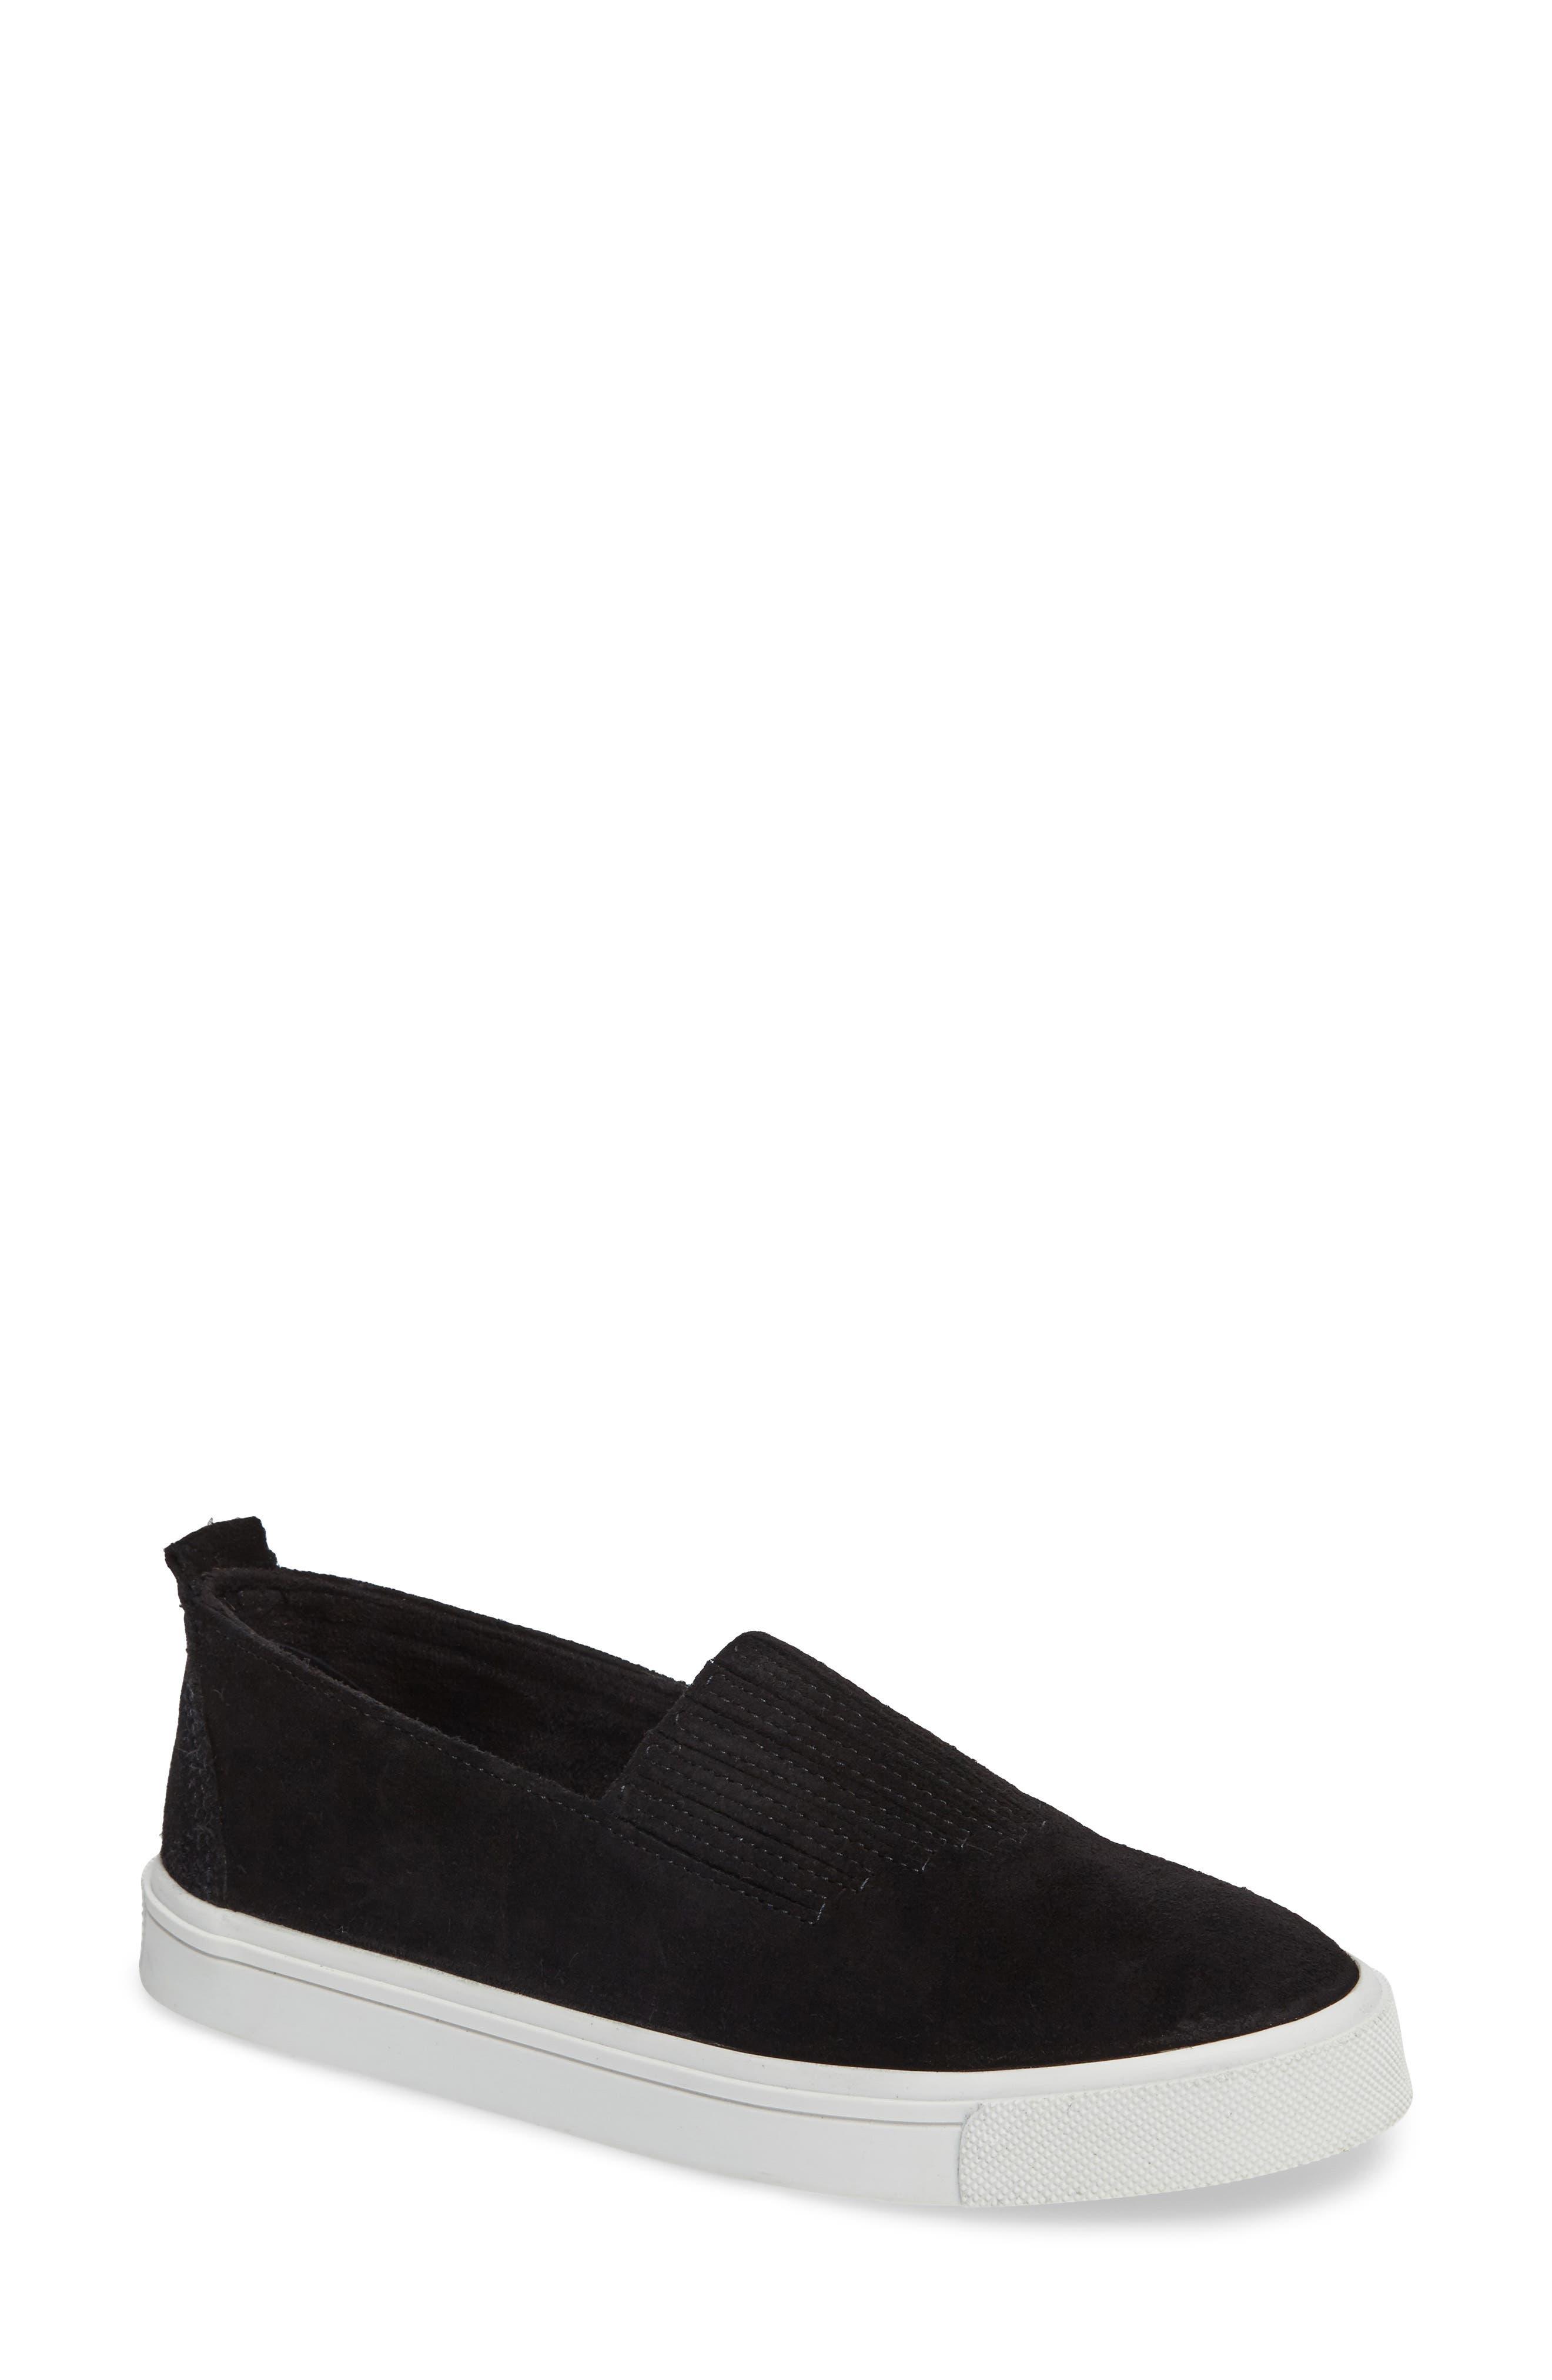 Minnetonka Gabi Slip-On Sneaker- Black